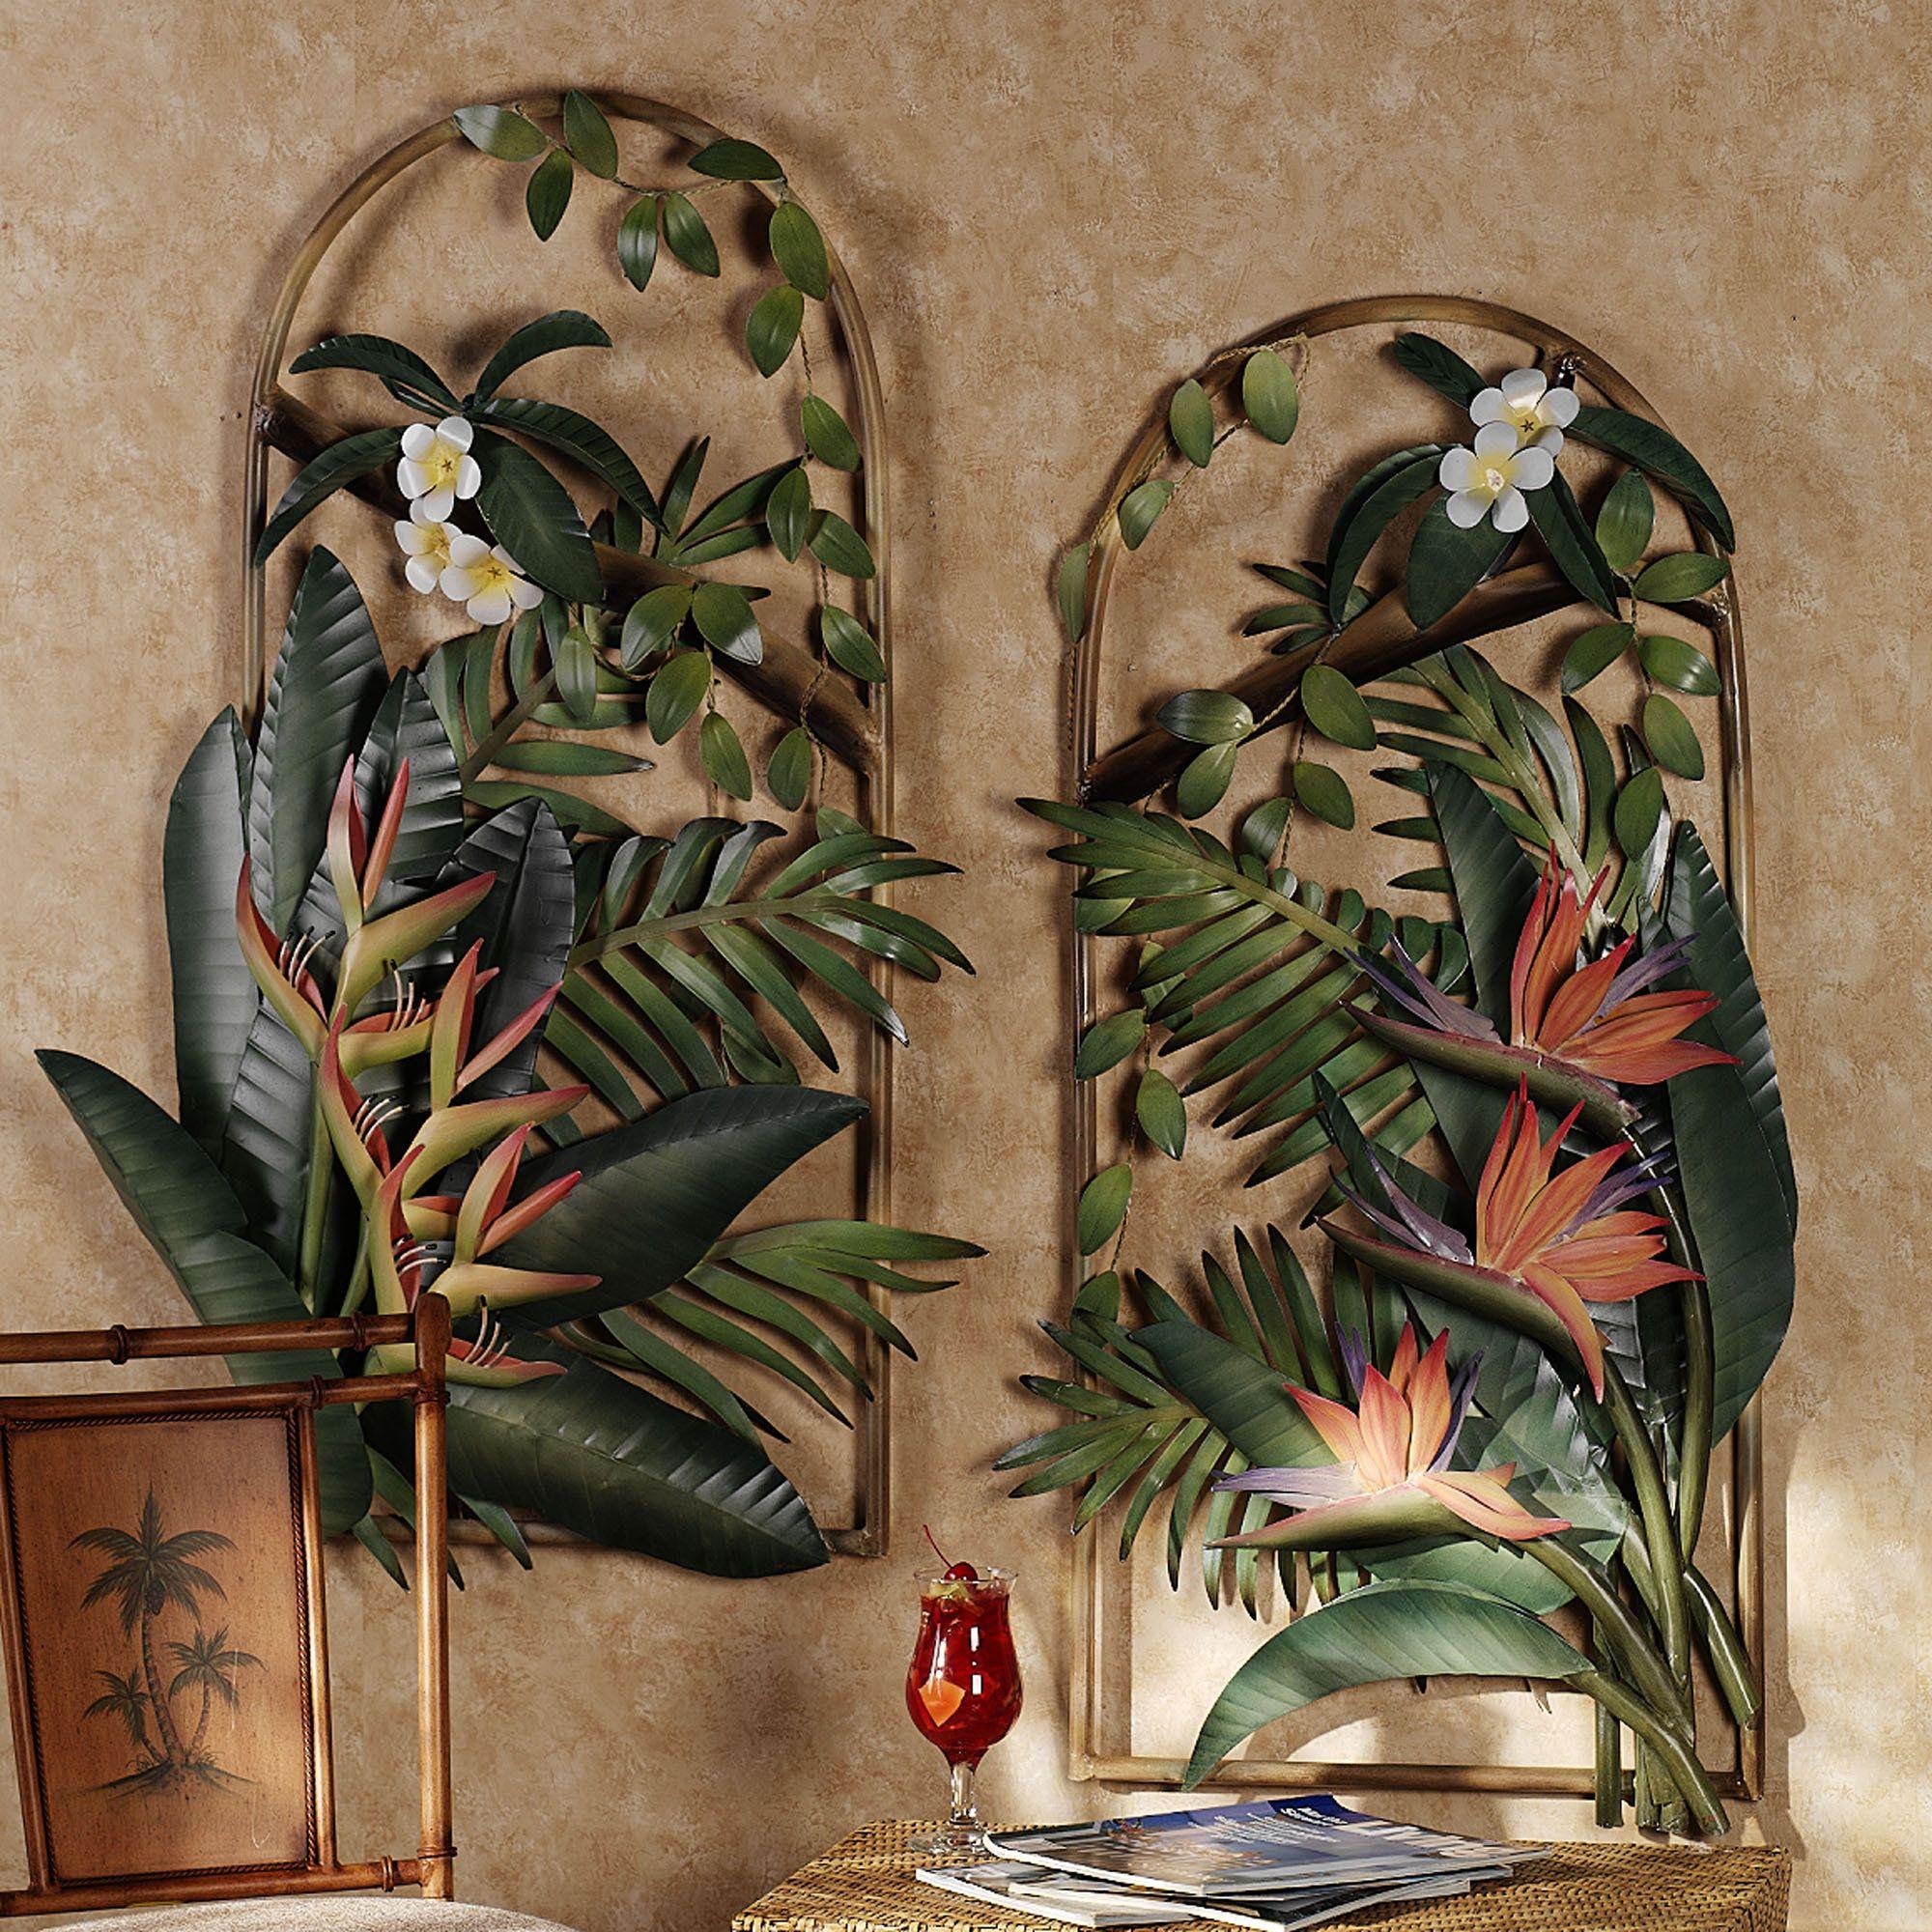 Tropical gardens arches metal wall sculptures house decor